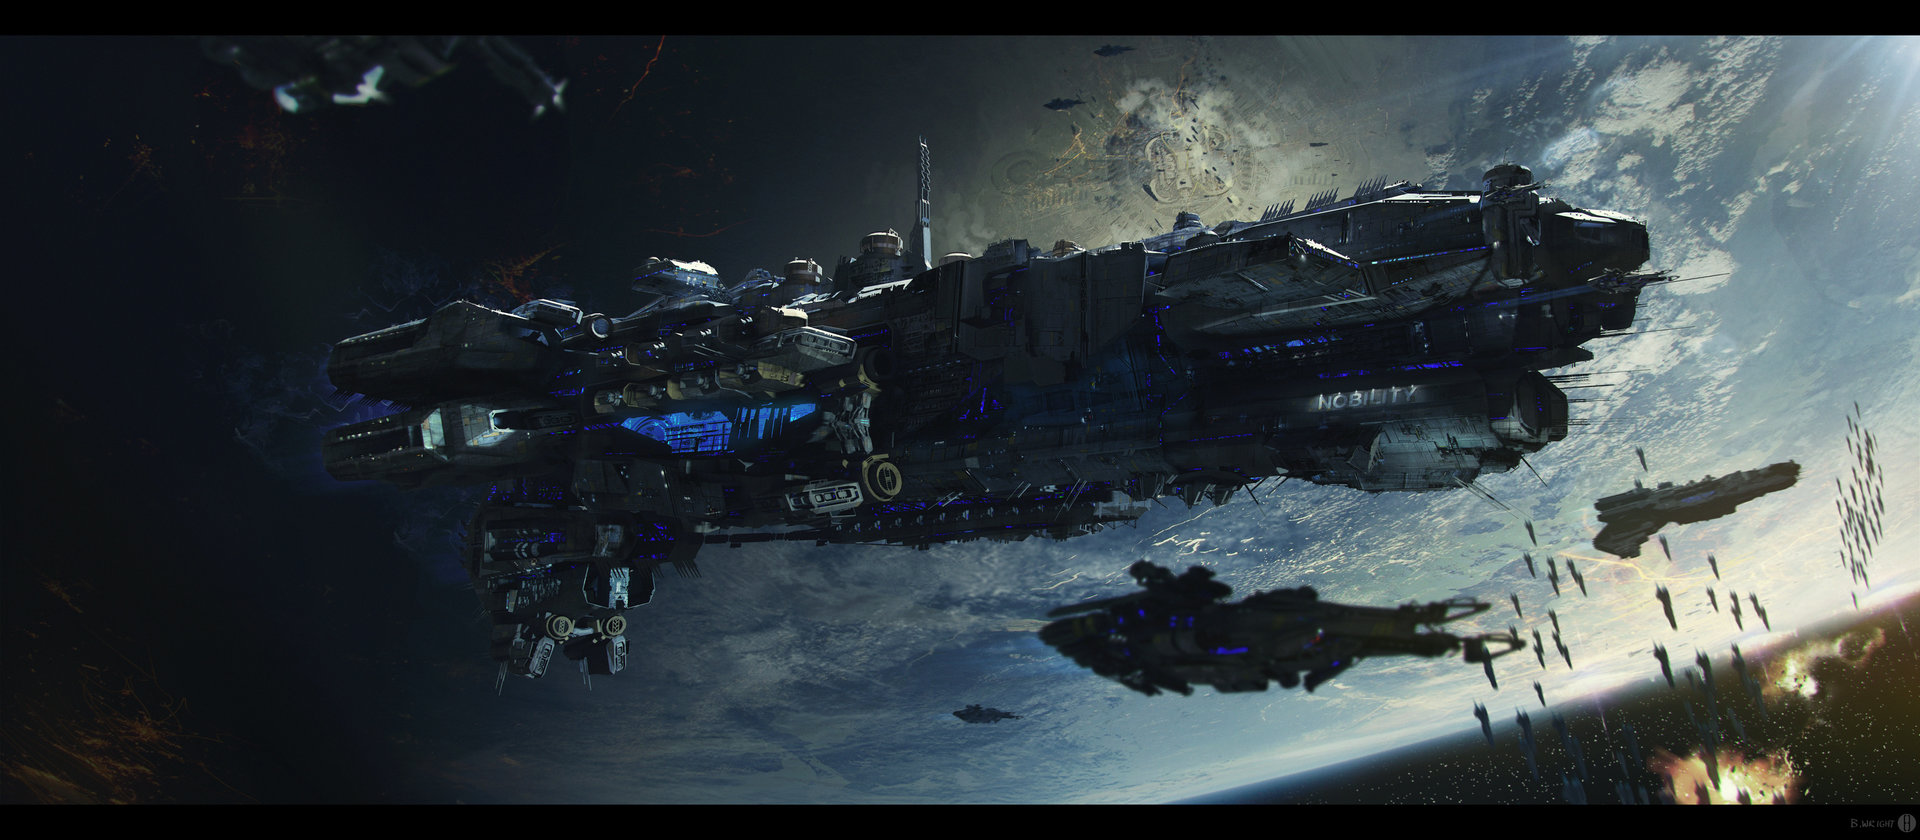 brad-wright-cruiser-in-orbit-01